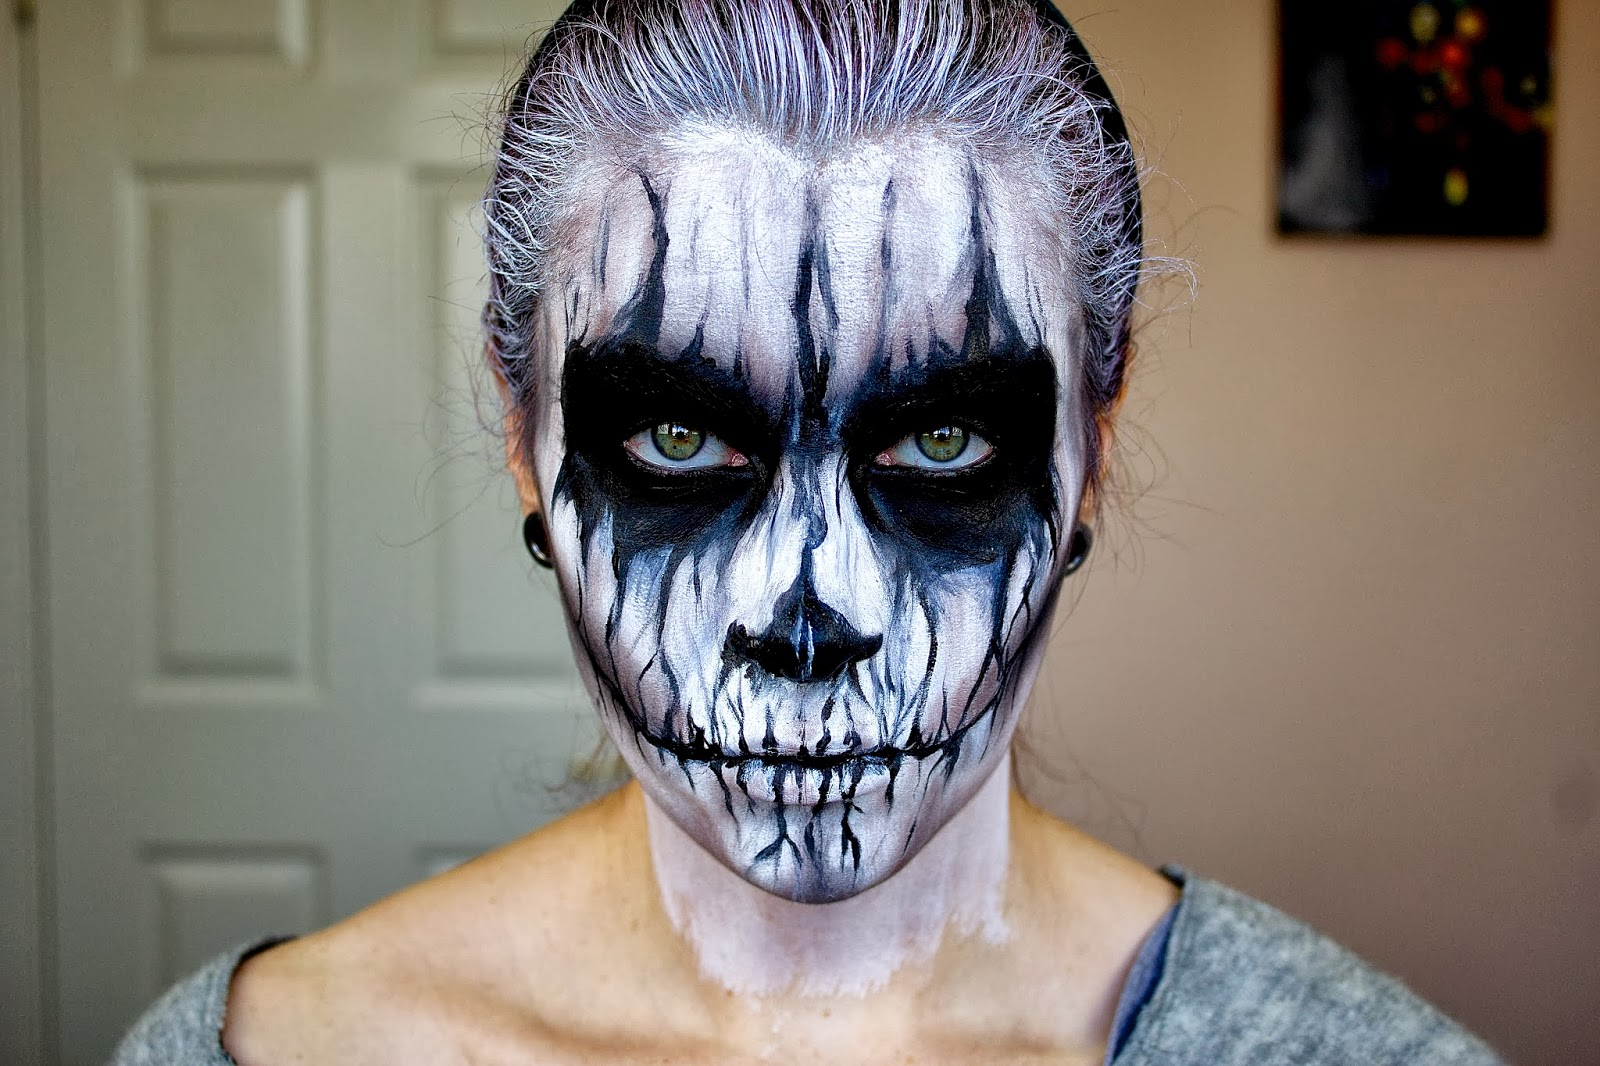 Грим на лицо на хэллоуин картинки